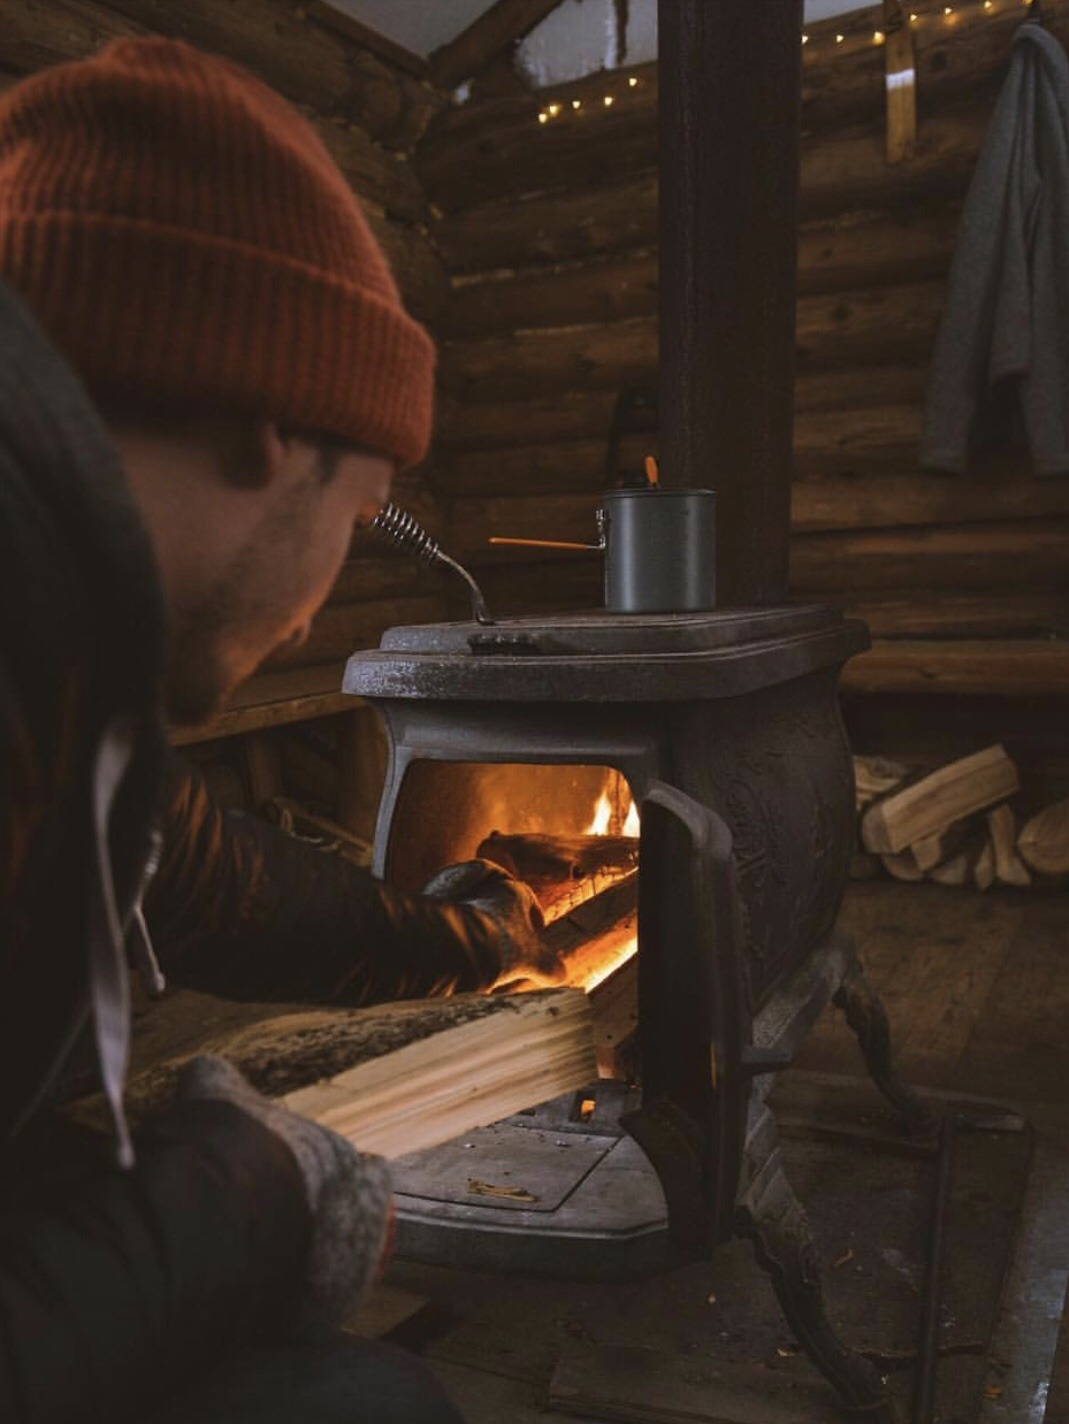 man adding firewood to stove